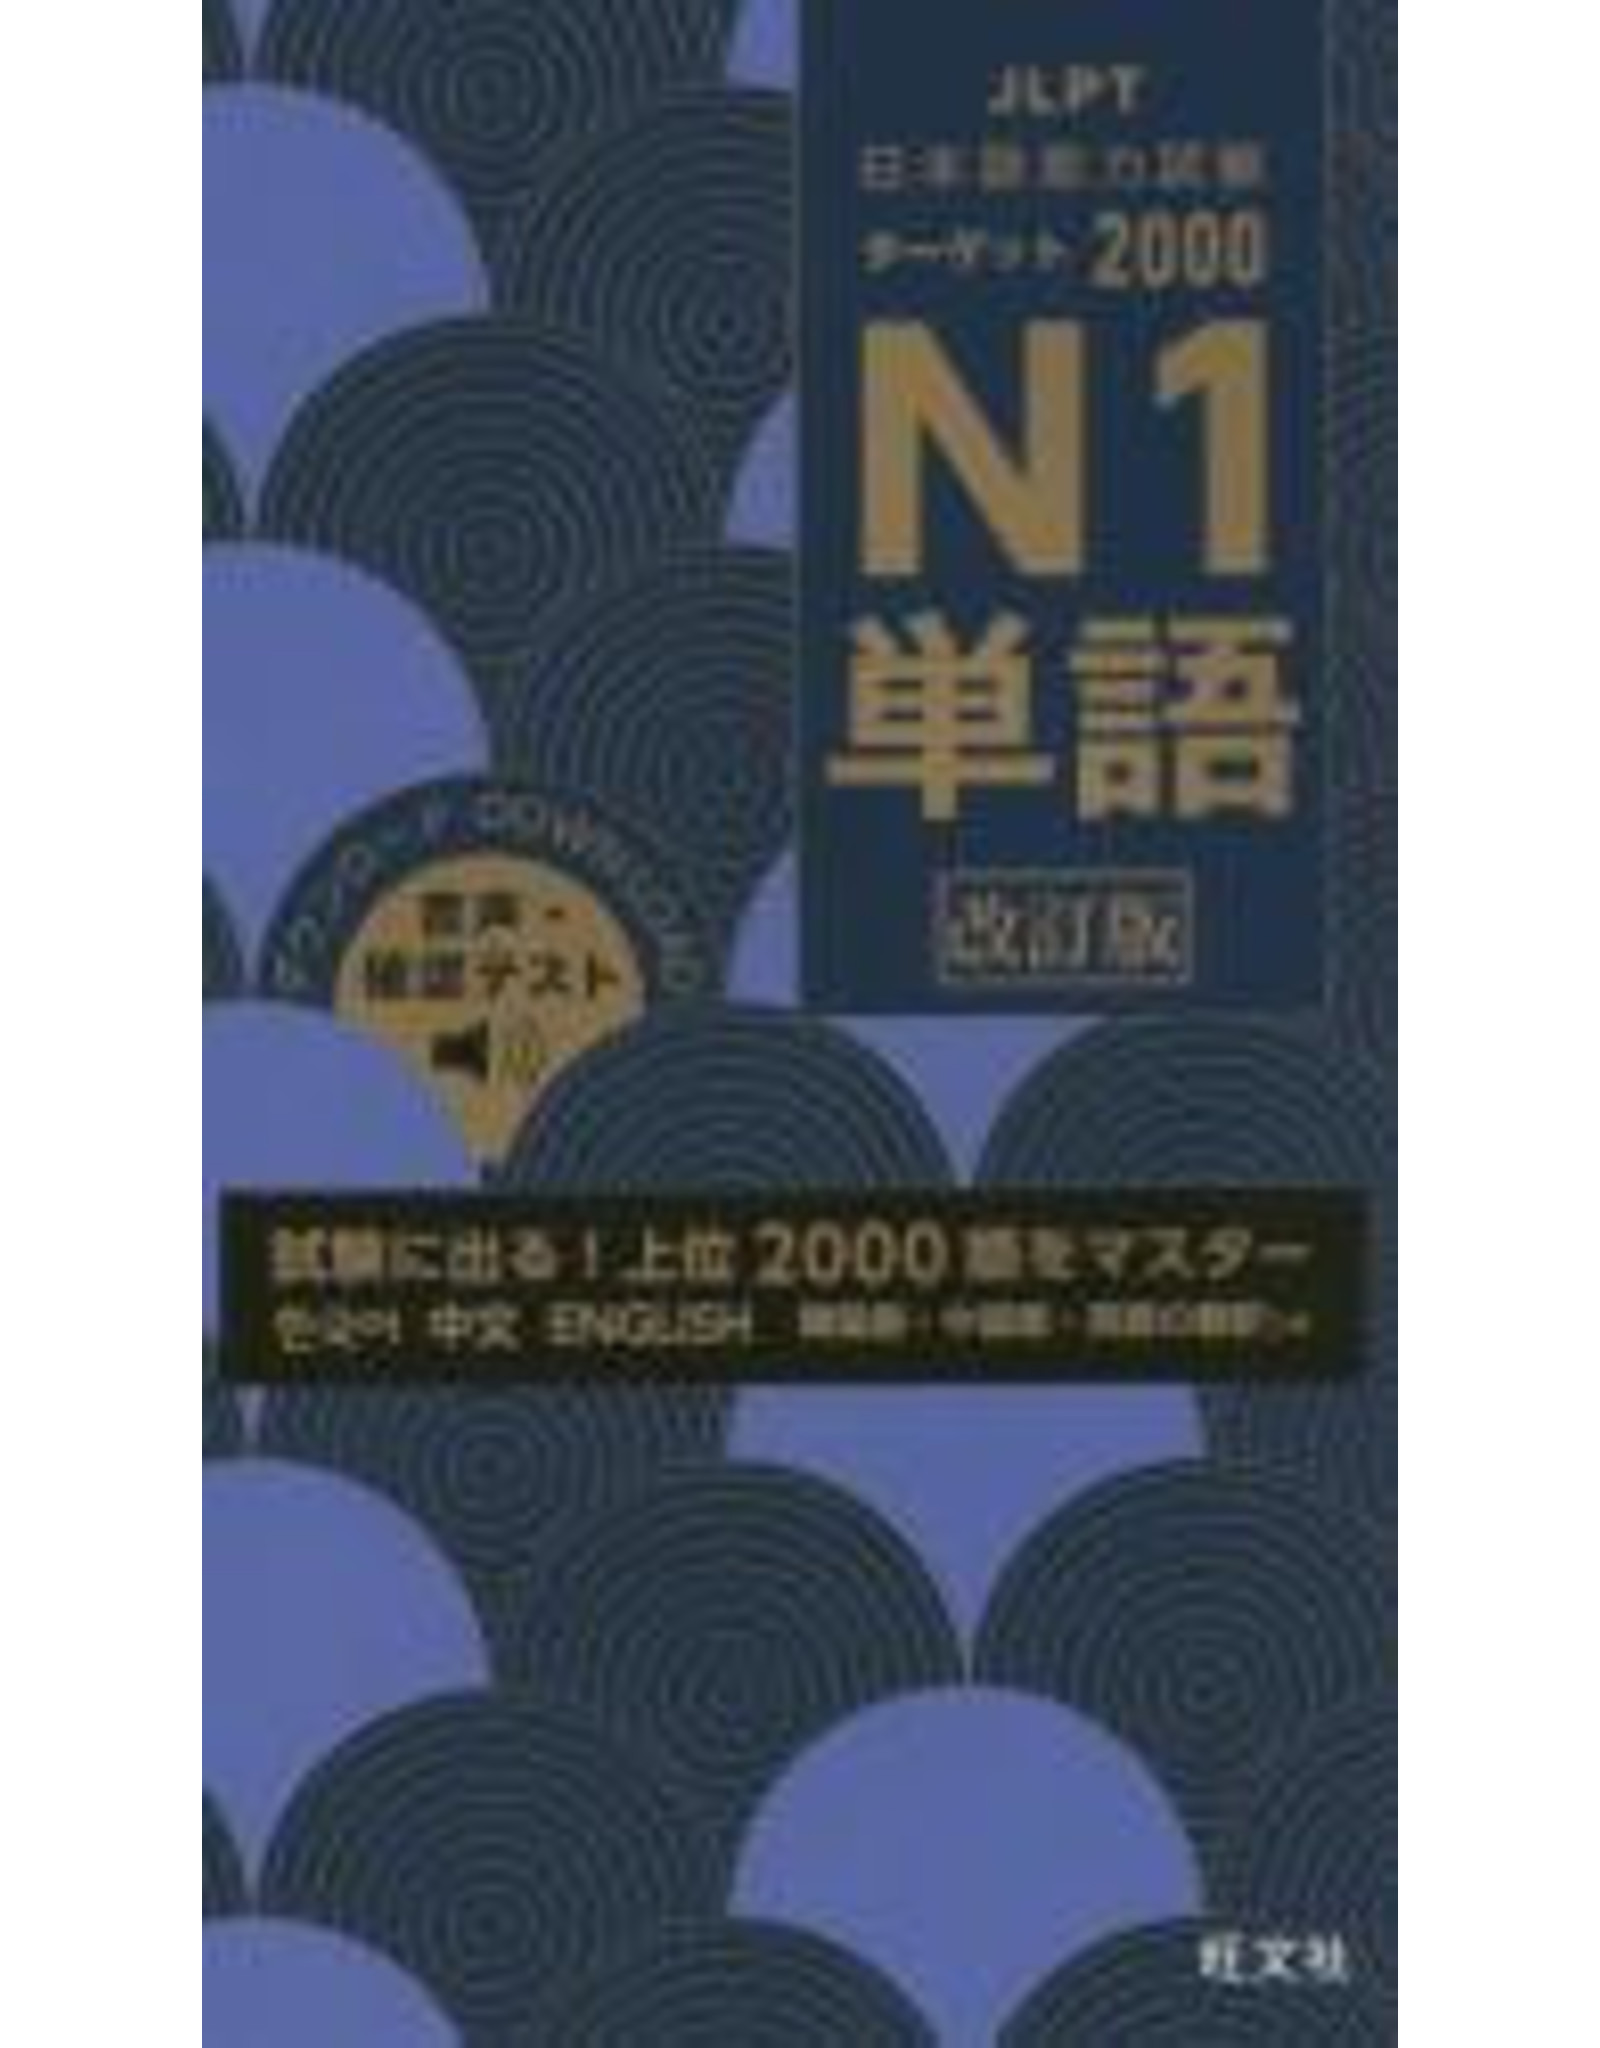 JLPT TARGET 2000 N1 TANGO REVISED EDITION